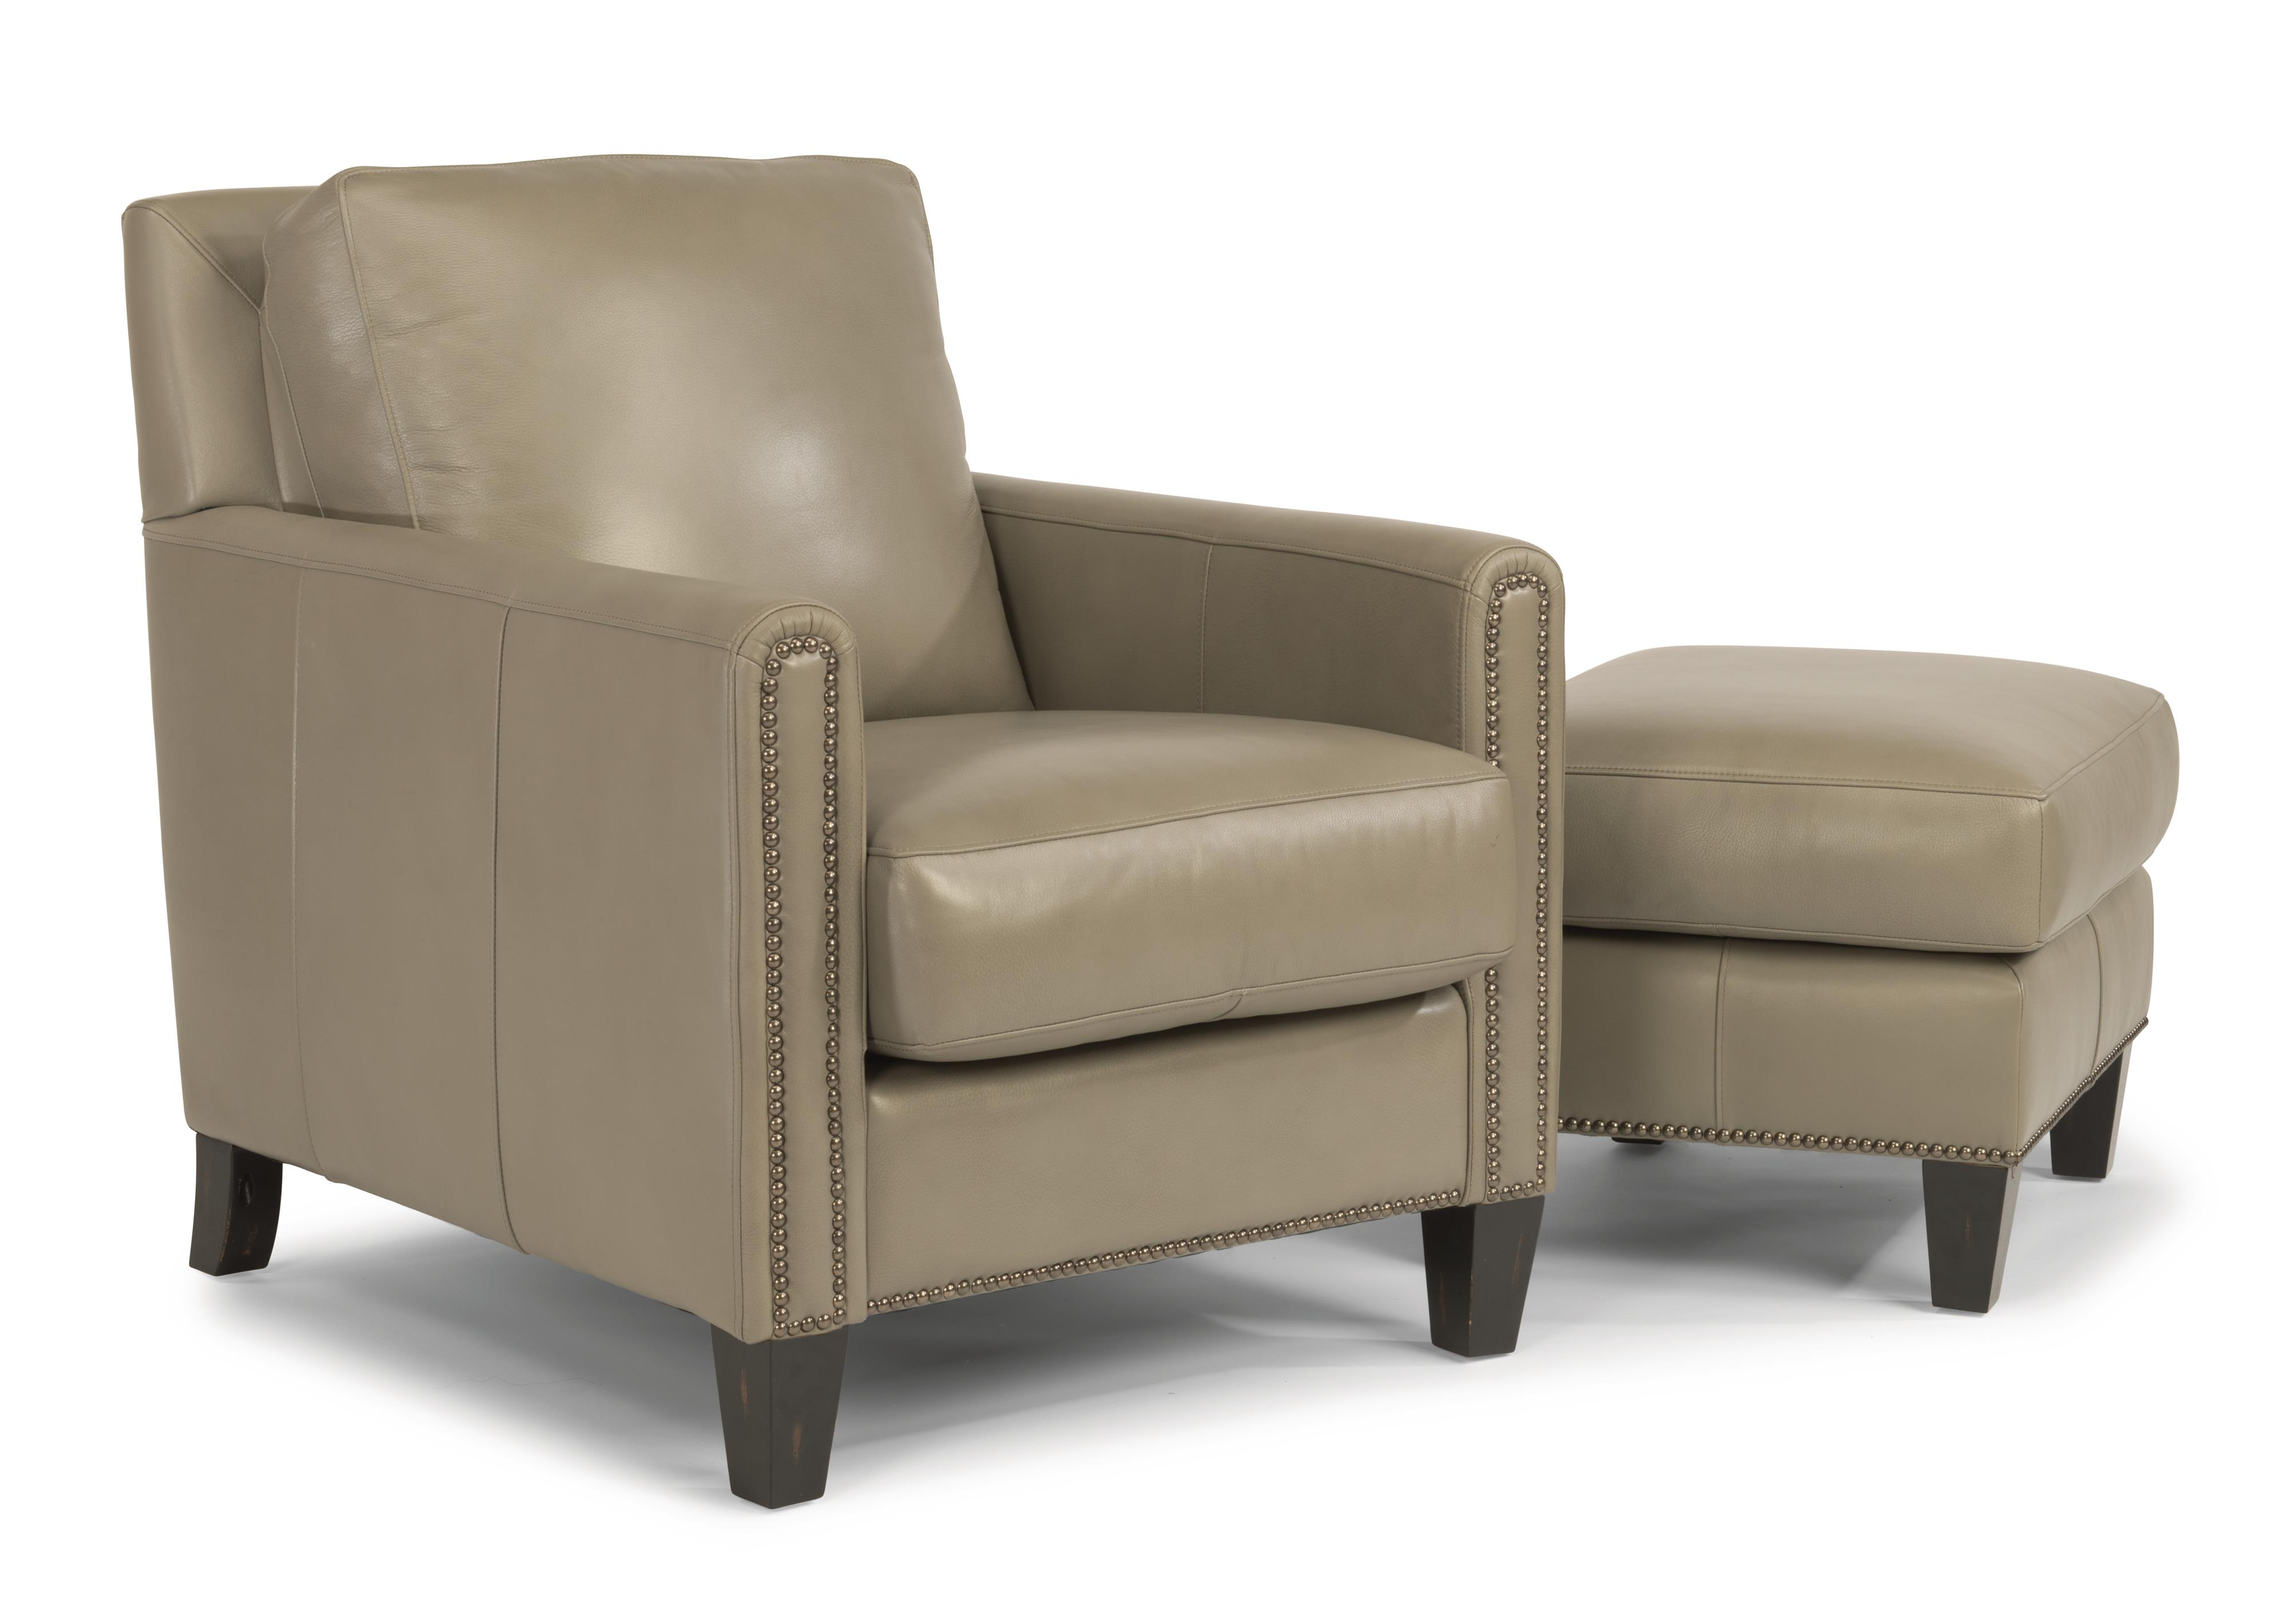 Flexsteel Latitudes-Reuben Chair & Ottoman Set - Item Number: 1209-10-LSP-05